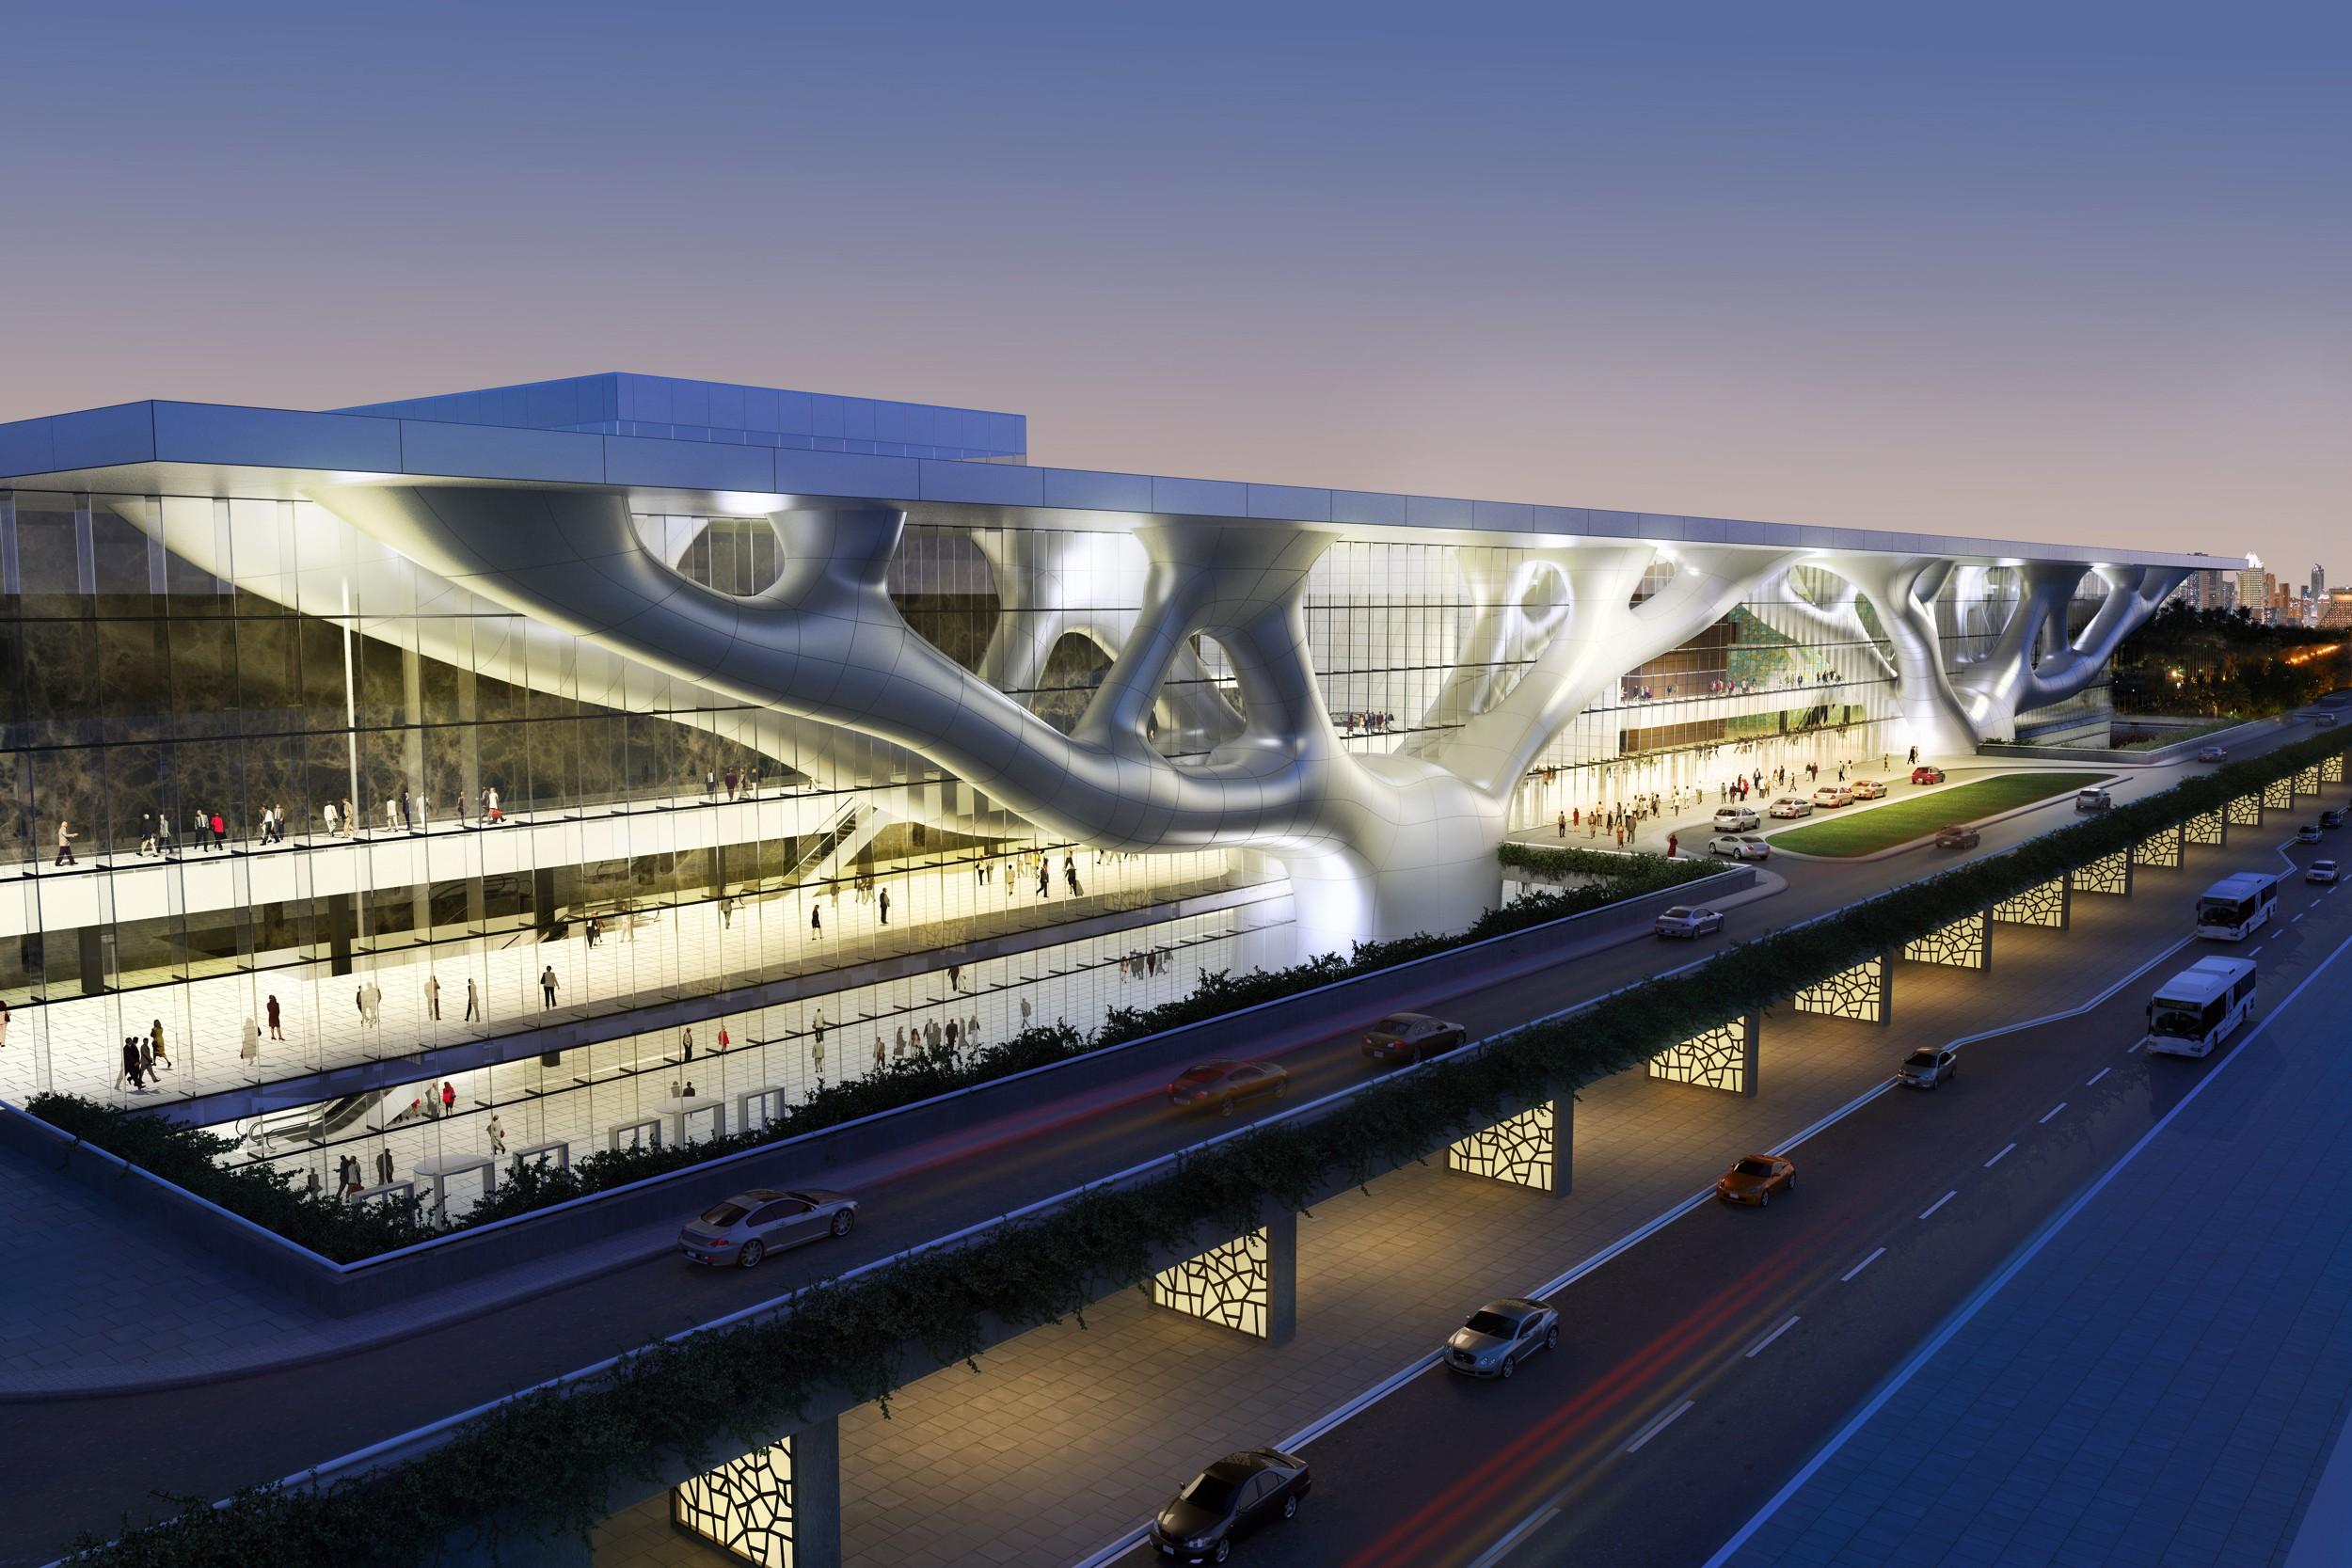 Qatar National Convention Centre Doha Qatar